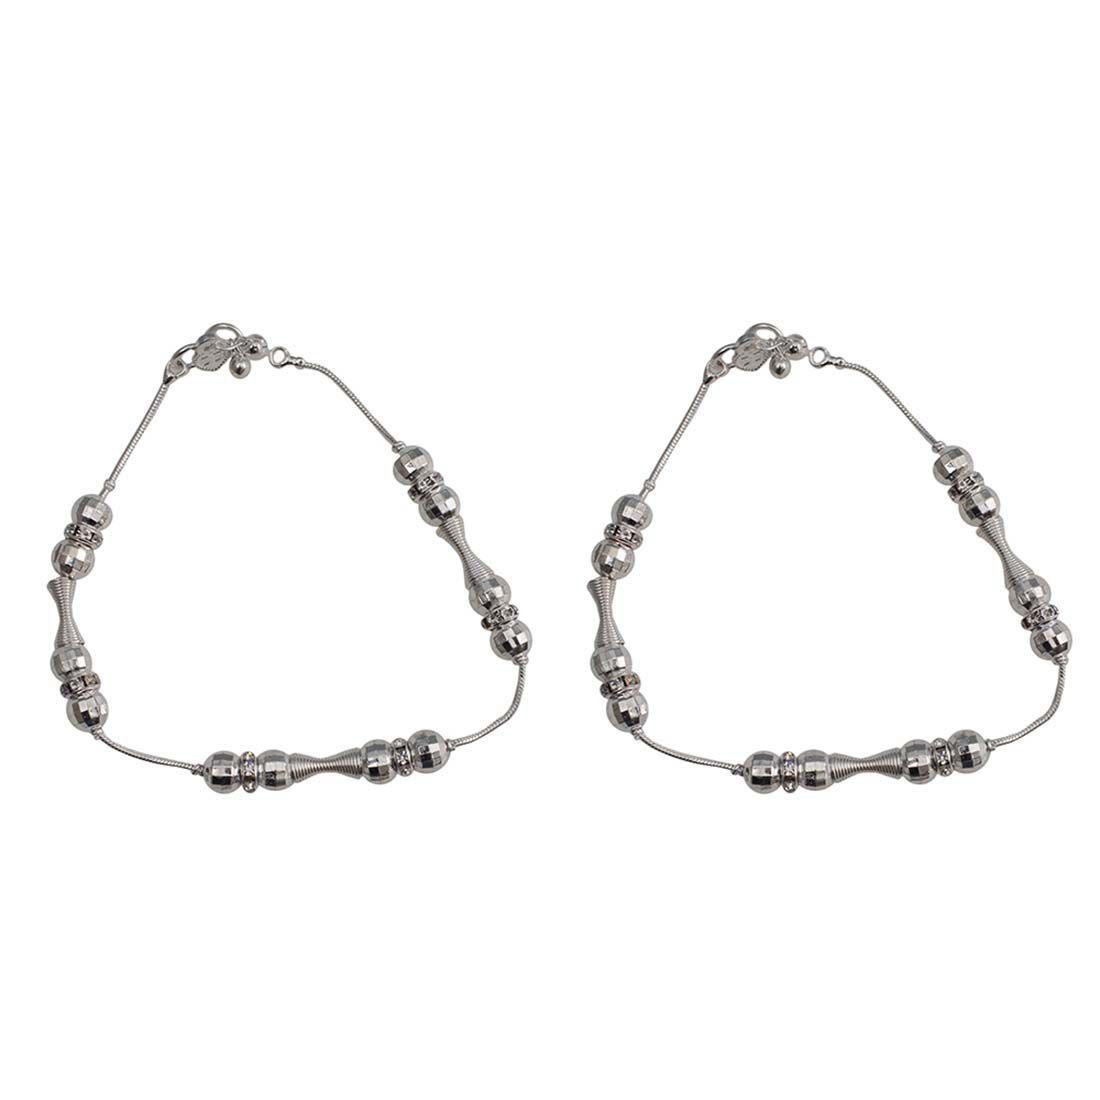 Taj Pearl Designer Silver Plated Anklets